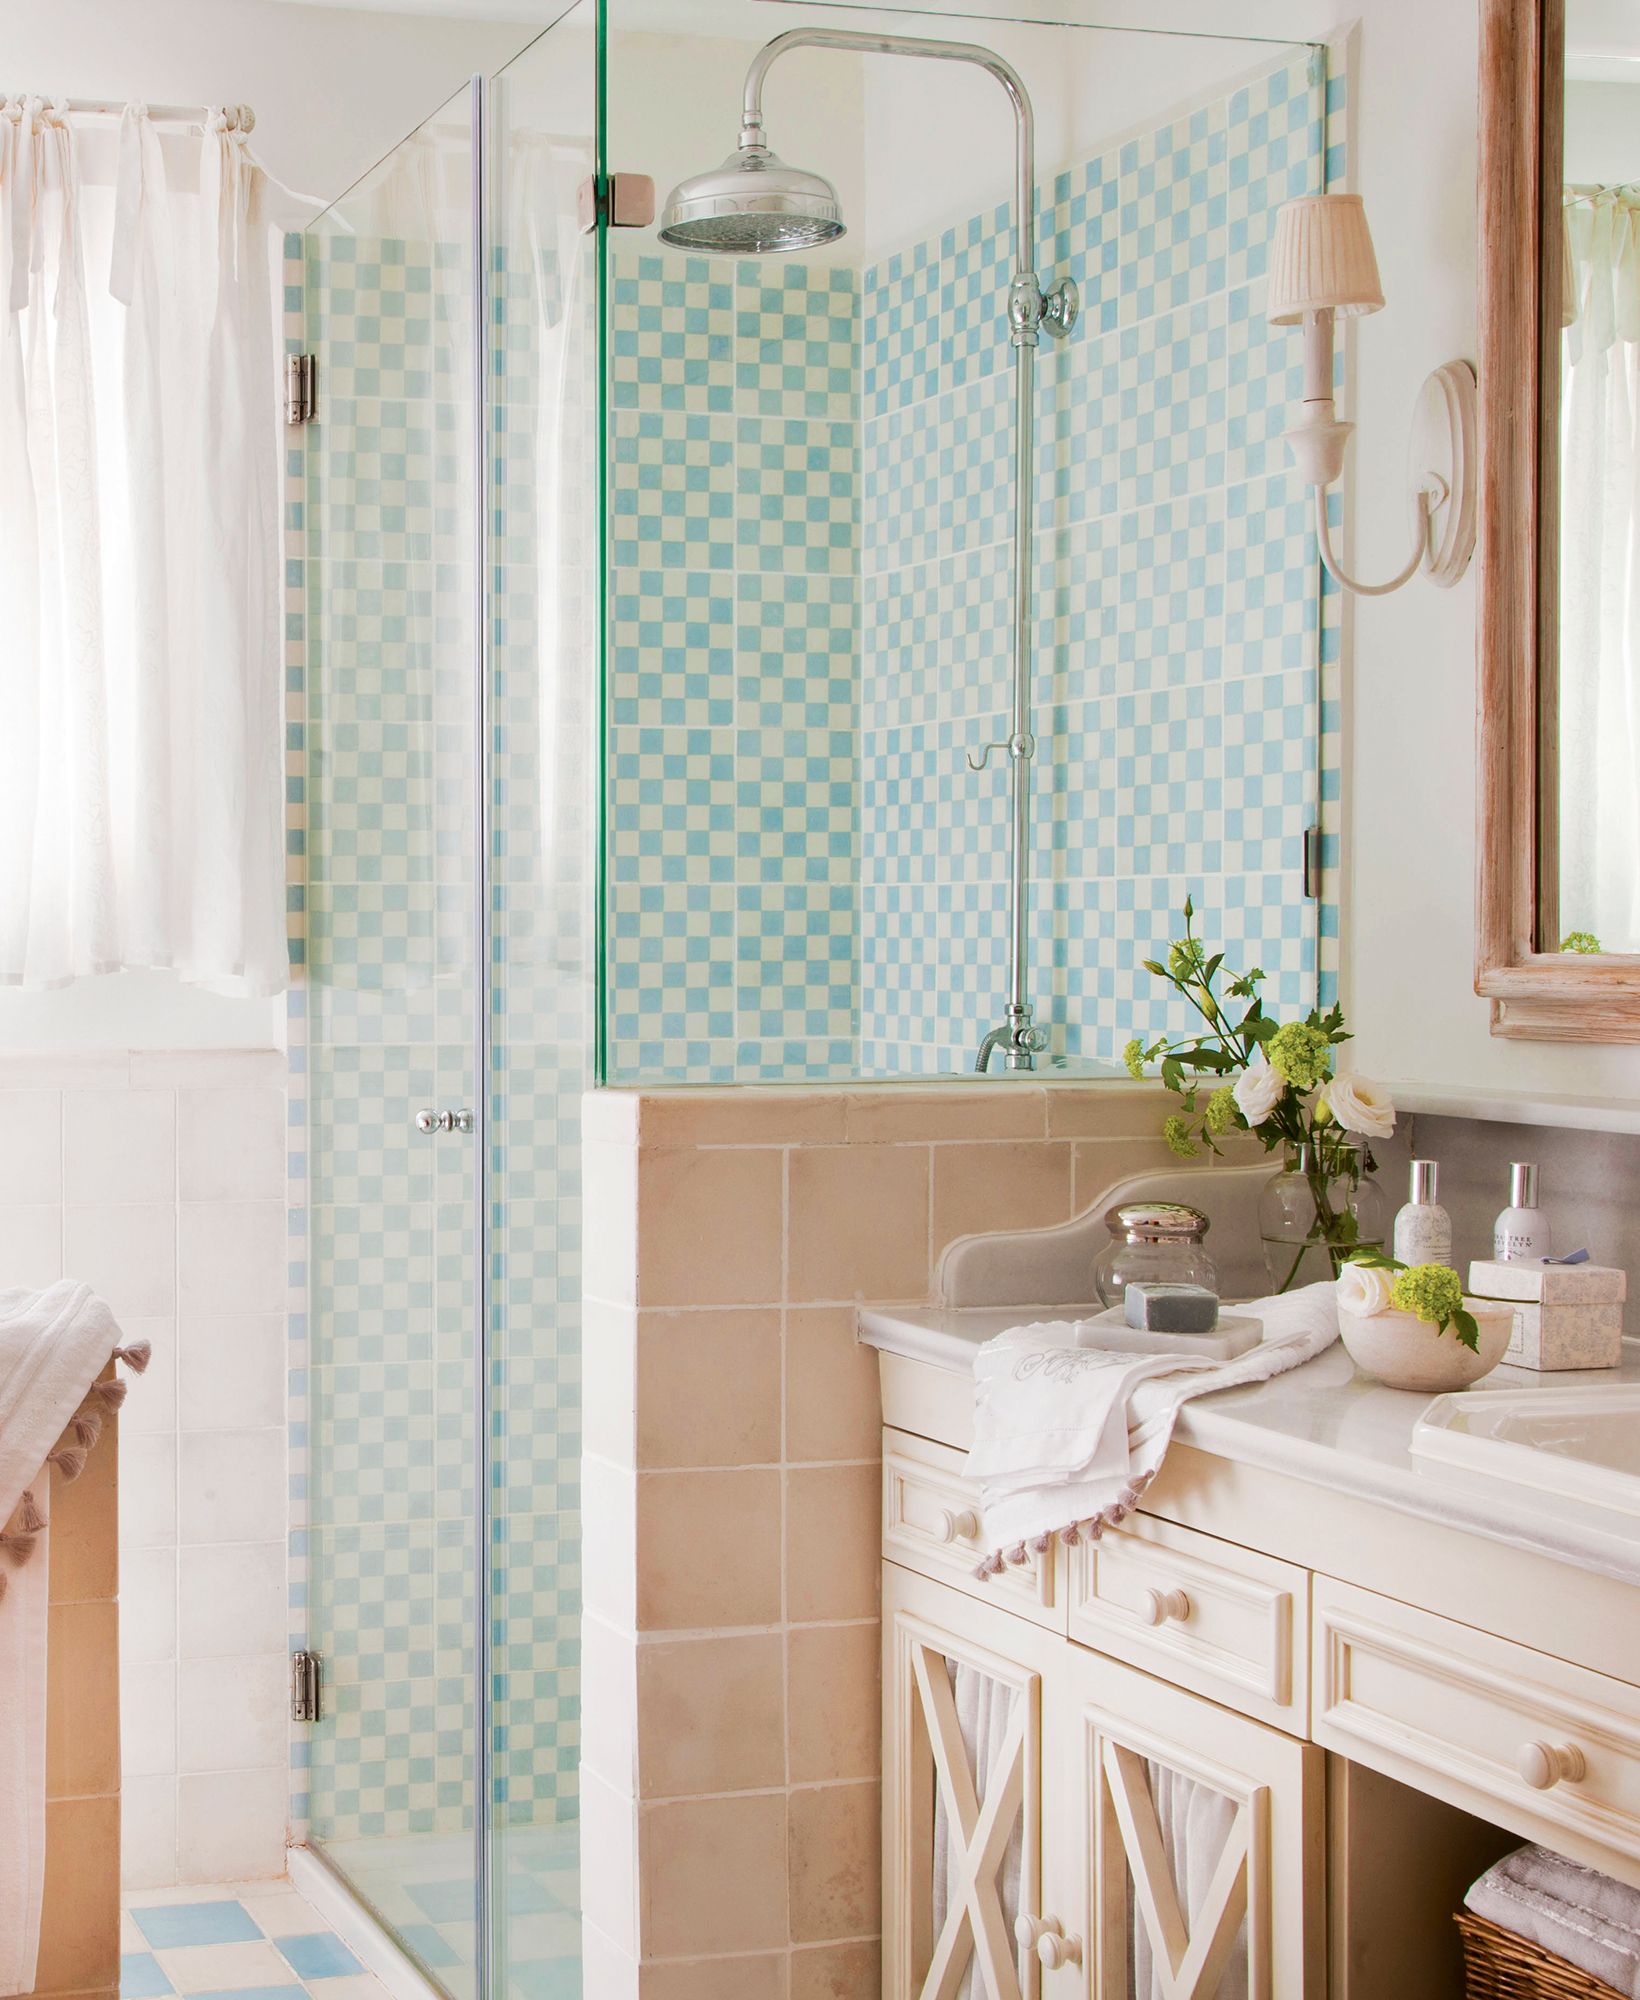 Маленькая ванная комната во французском стиле